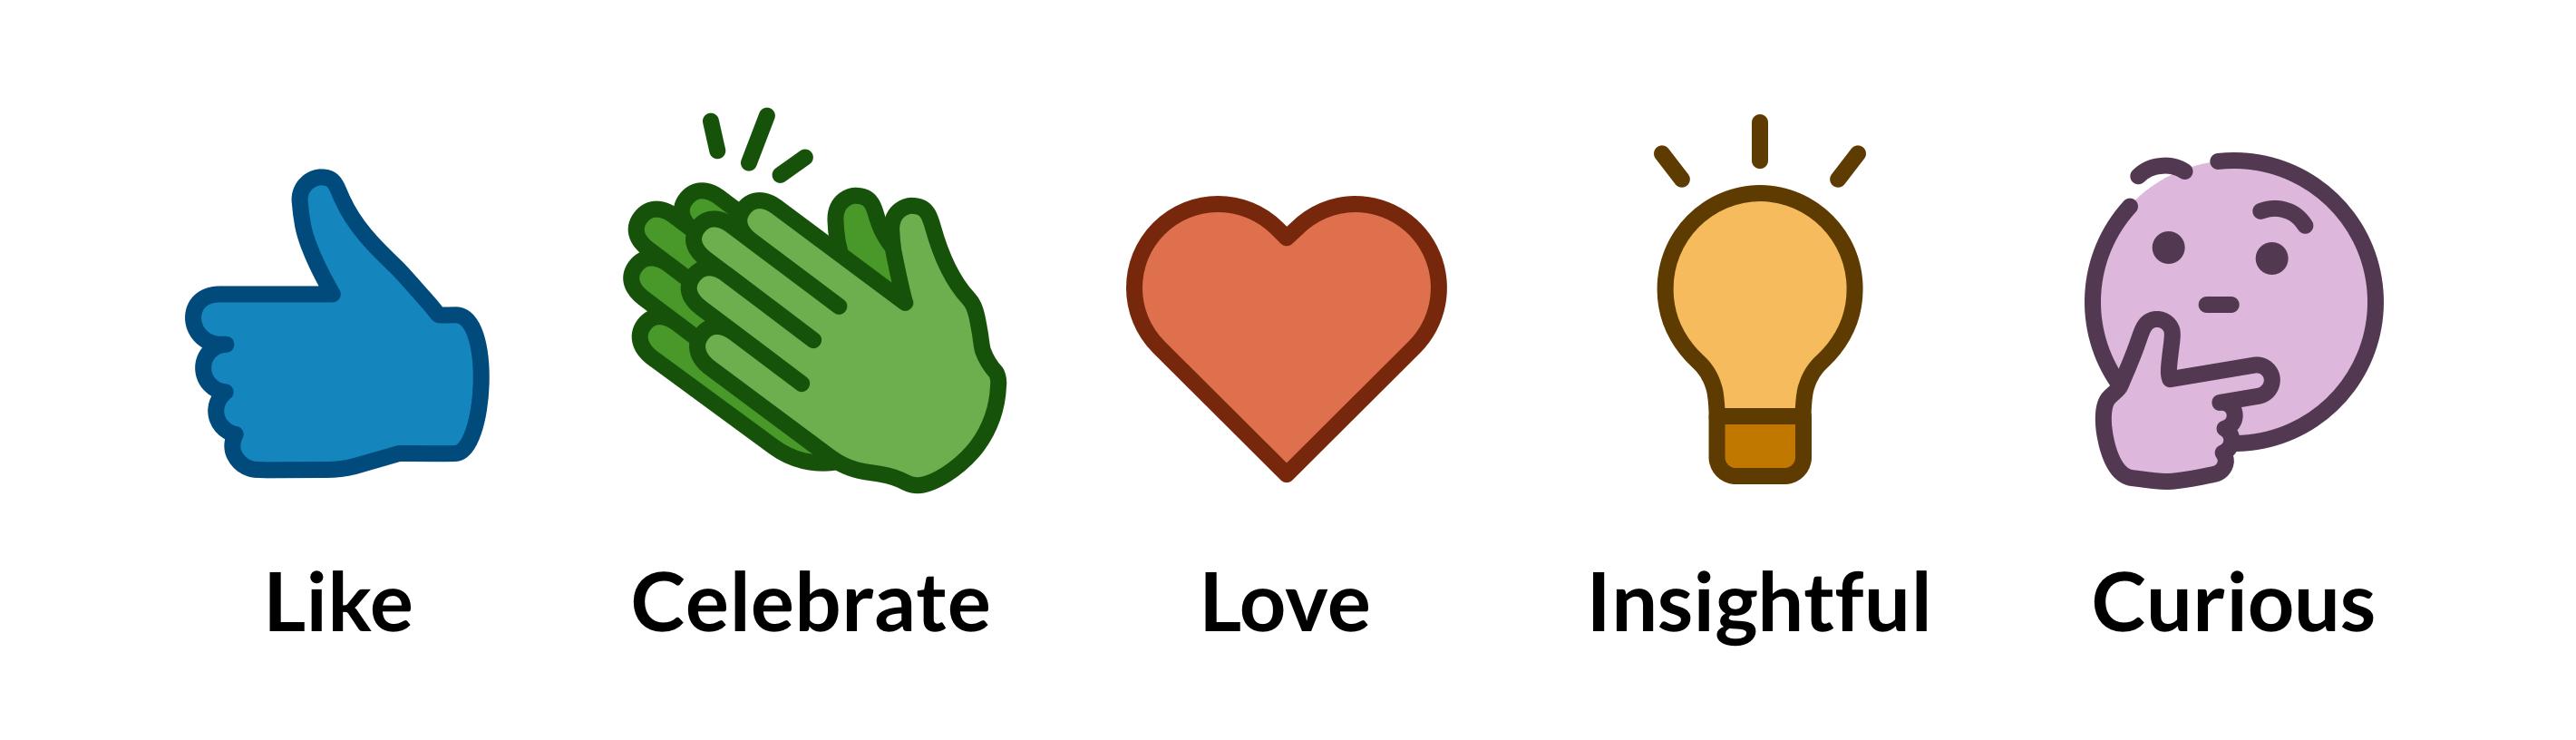 Linkedinin viisi reaktiota